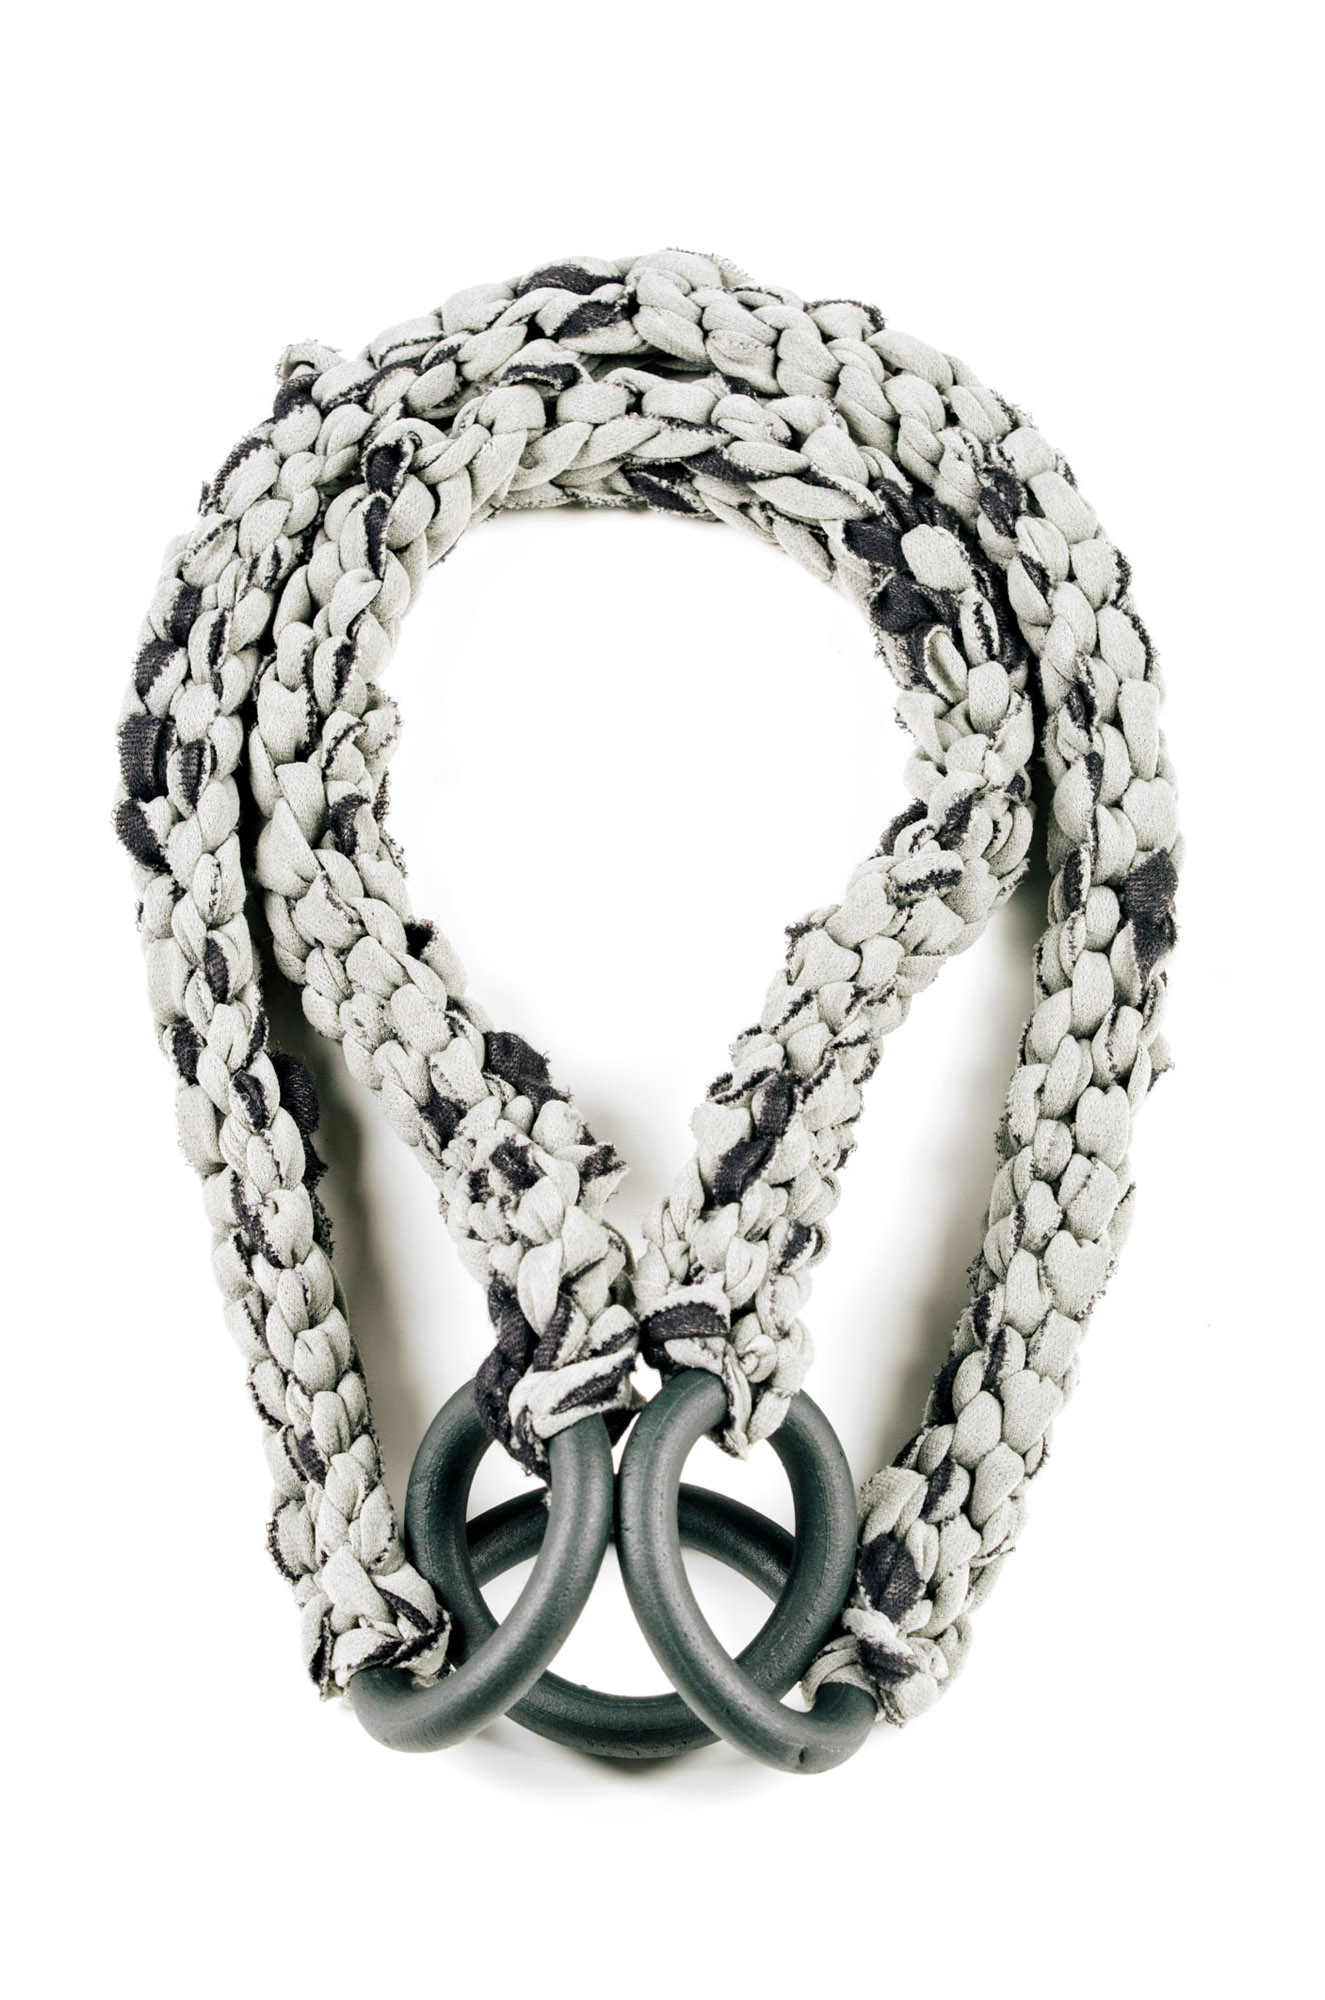 Bocco necklace by Anna Borshi 09.jpg